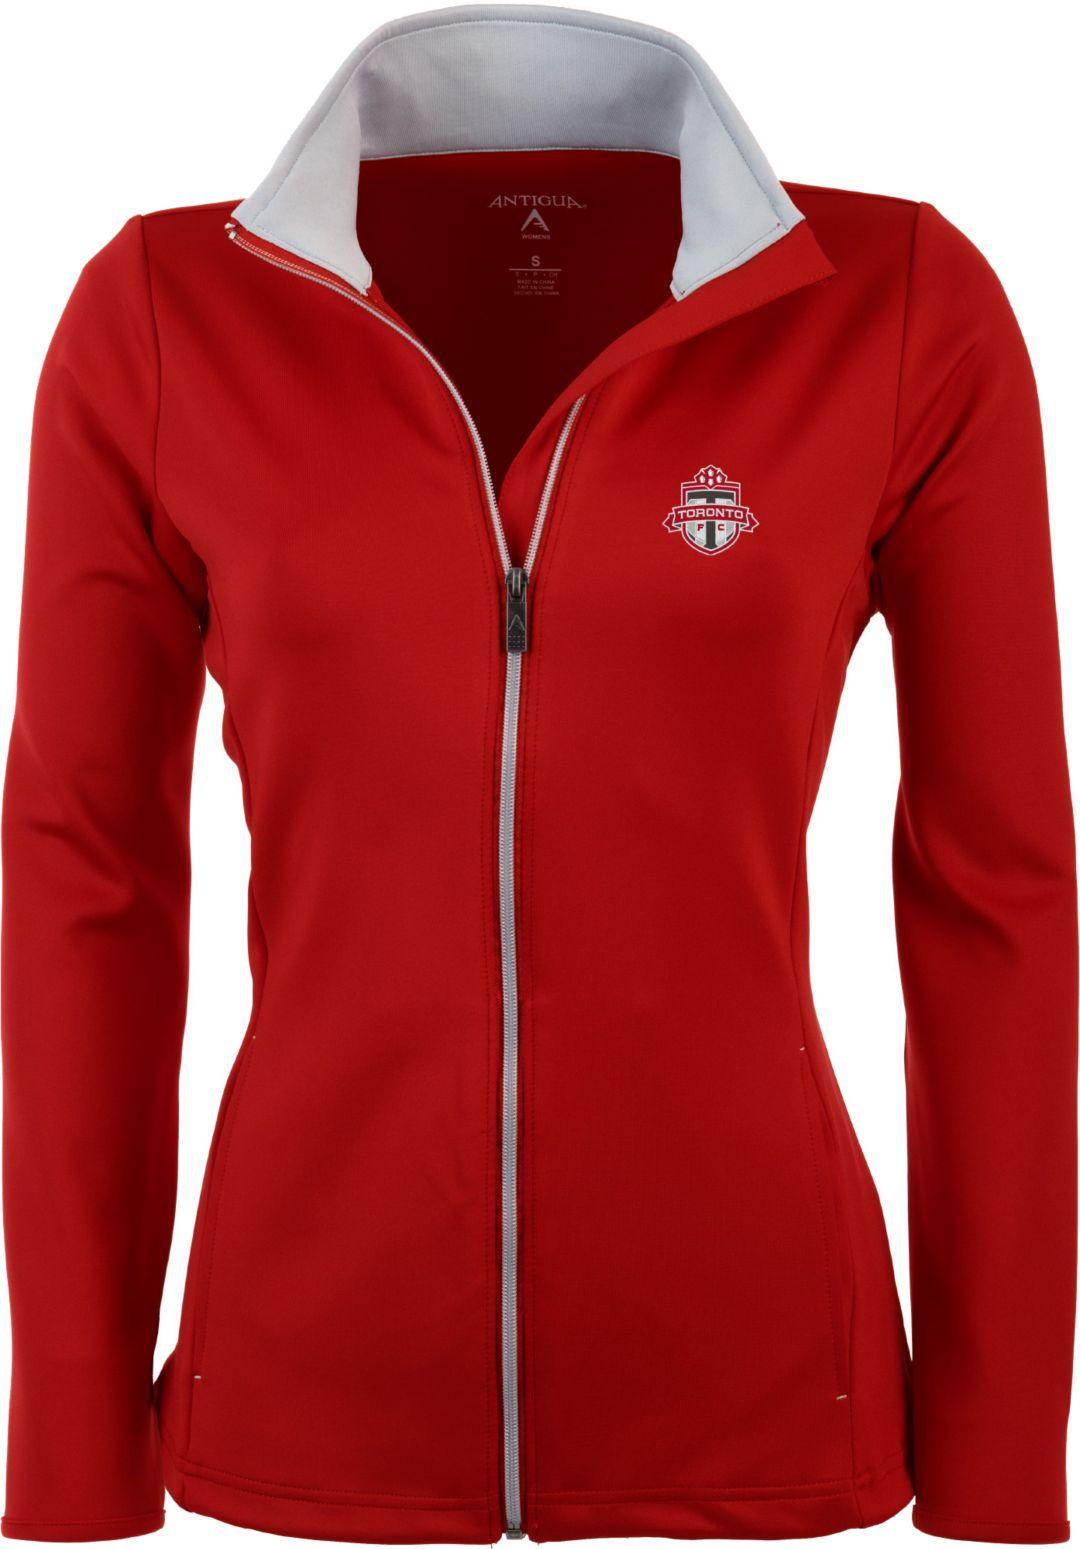 new arrival dc197 2390f Antigua Women's Toronto FC Red Leader Full-Zip Jacket